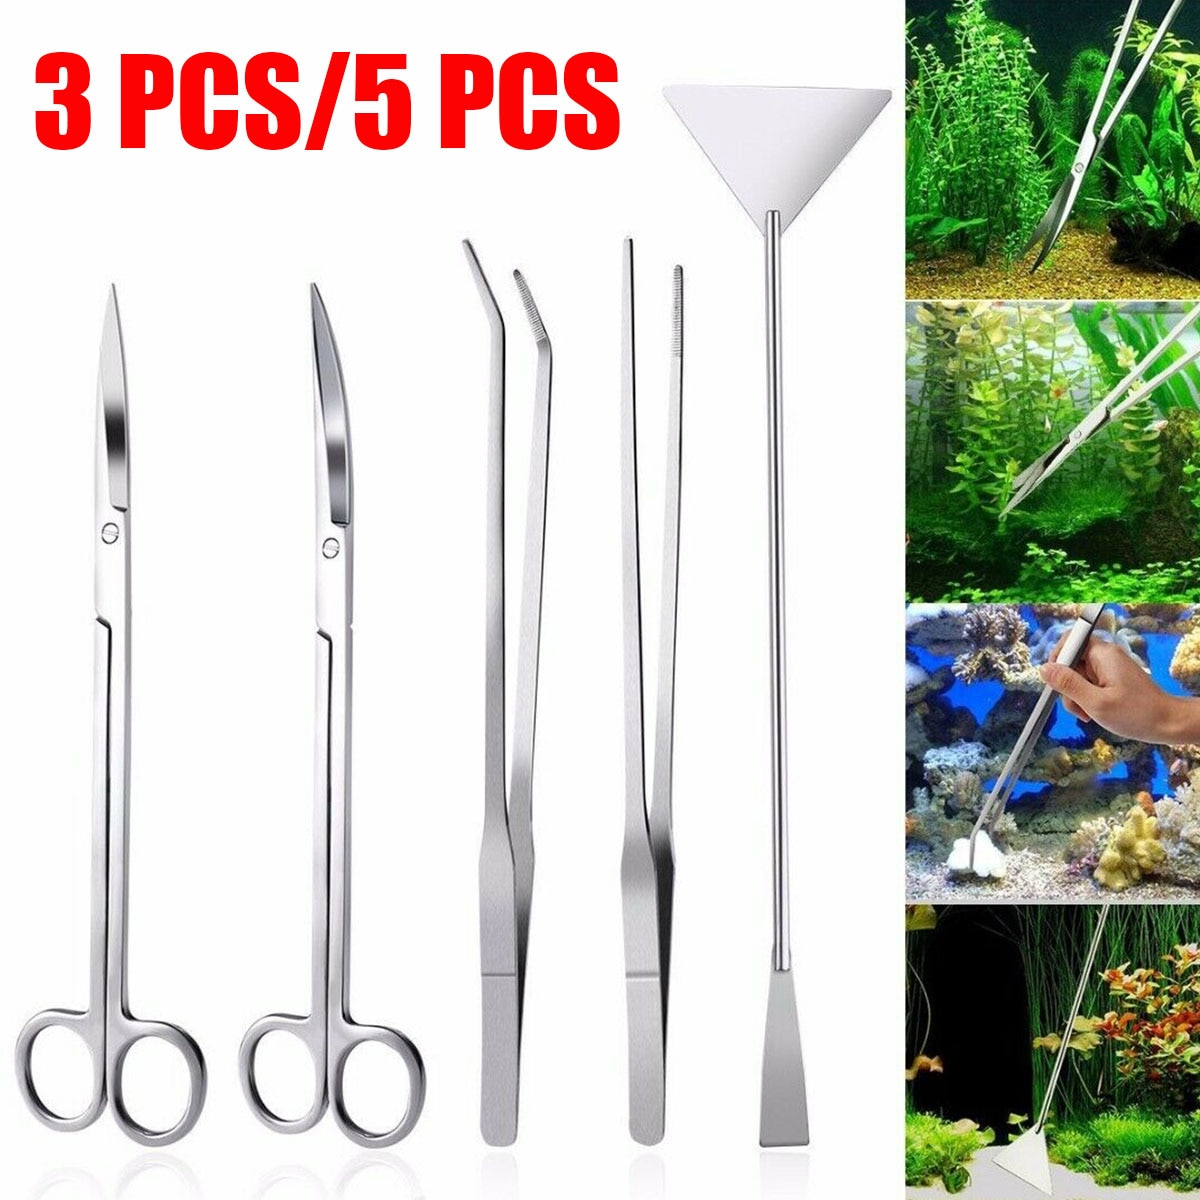 3/5pcs Aquarium Tank Tools Kit Aquascaping Fish Tank Aquatic Plants Long Tweezers Scissors Stainless Steel Maintenance Tool